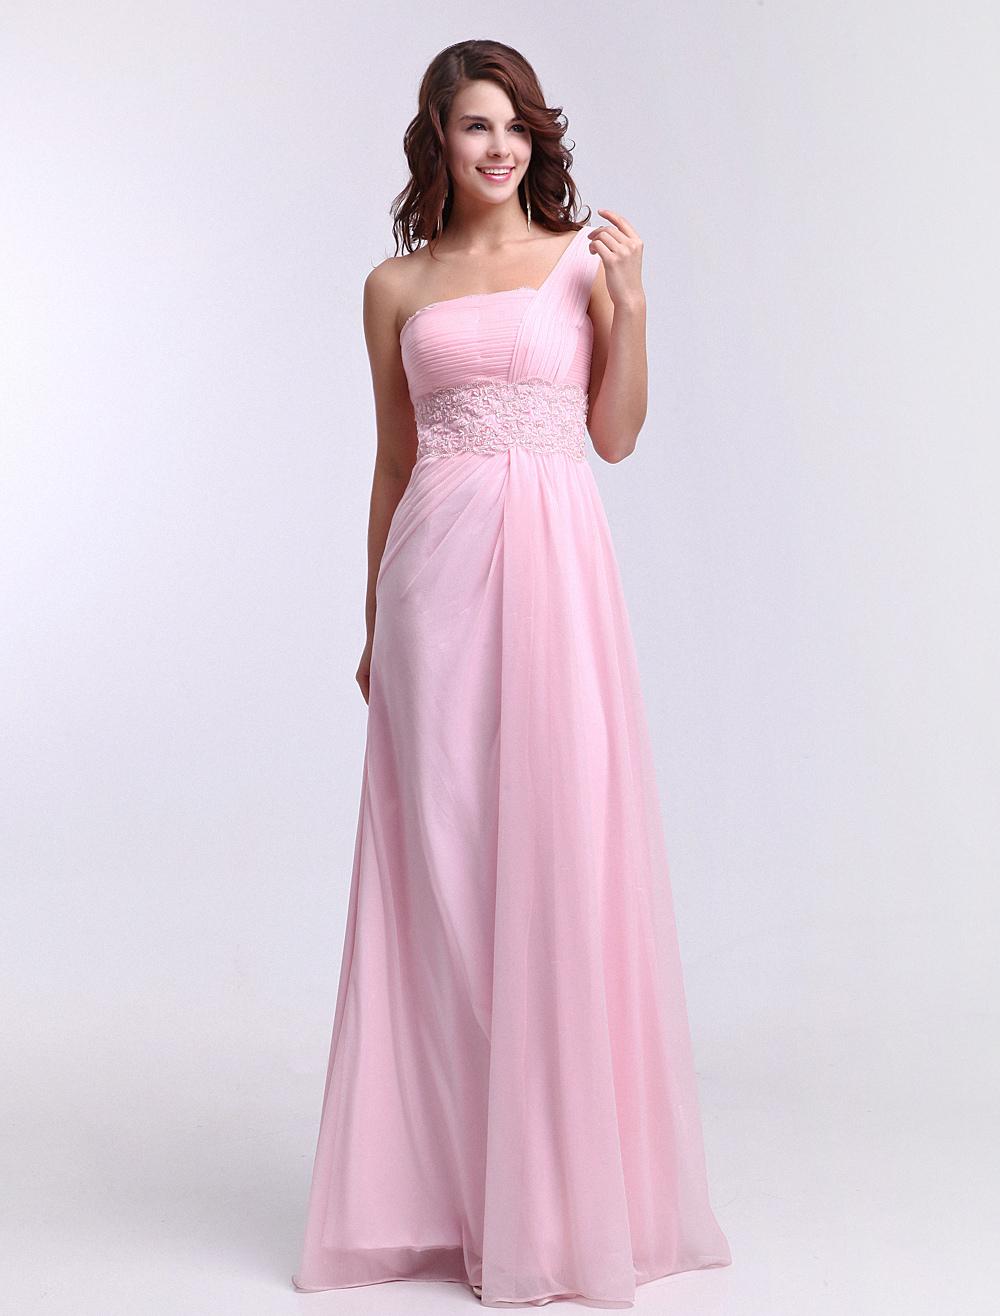 One-Shoulder Ruched Shot-silk Pink Elegant Bridesmaid Dress Milanoo (Wedding Bridesmaid Dresses) photo